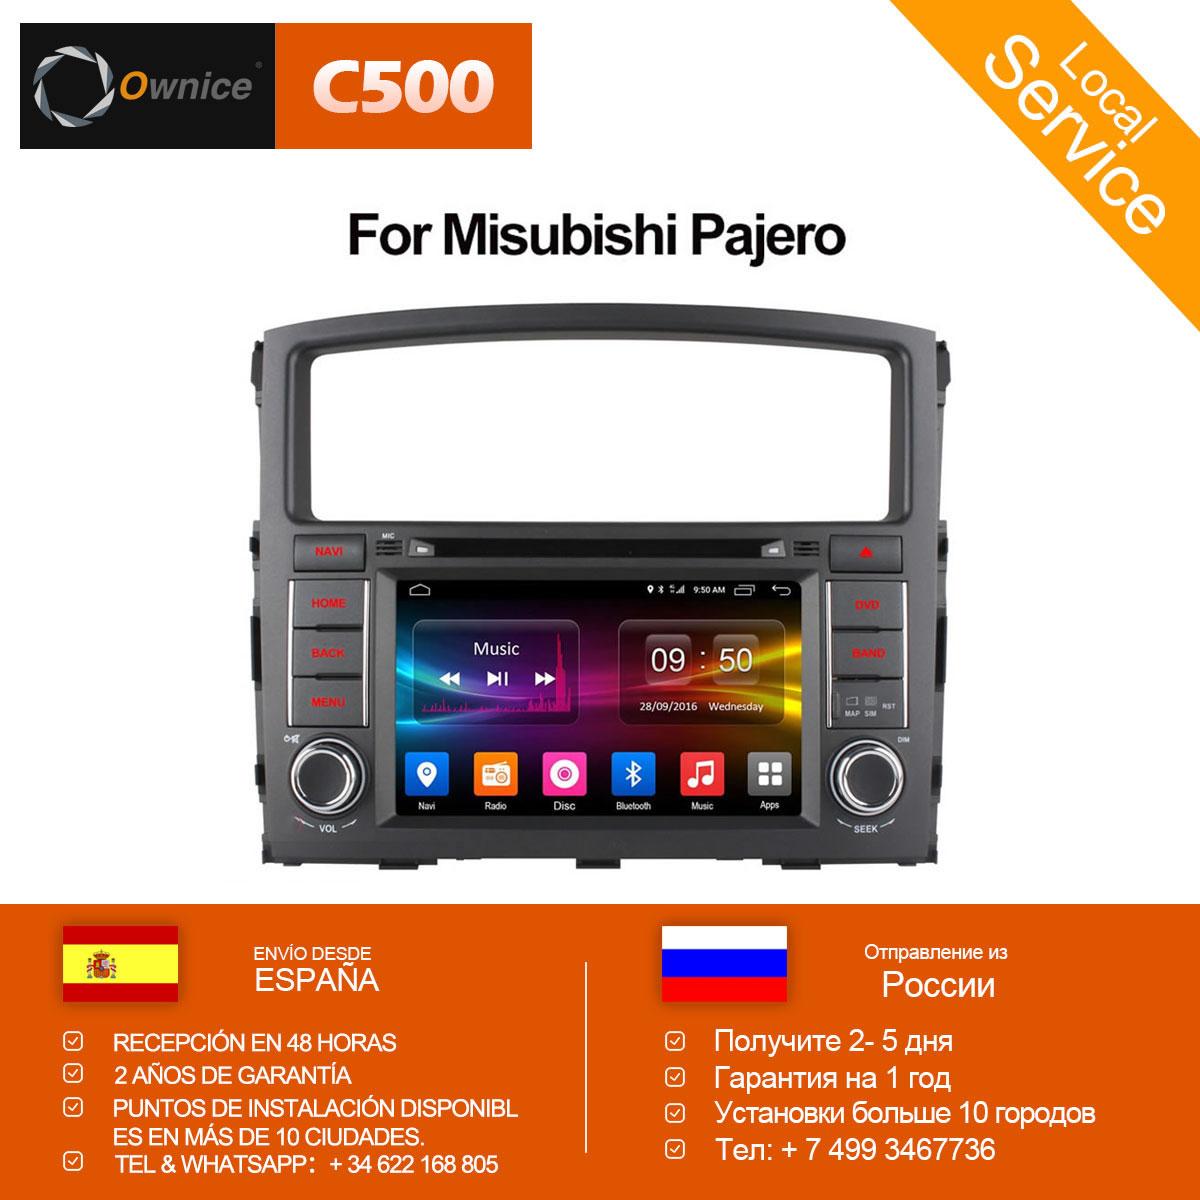 Ownice C500 Octa 8 Core Android 6.0 Pour MITSUBISHI PAJERO V97 V93 2006-2015 Lecteur DVD de Voiture GPS Navi soutien 4g DAB + TPMS 32g ROM